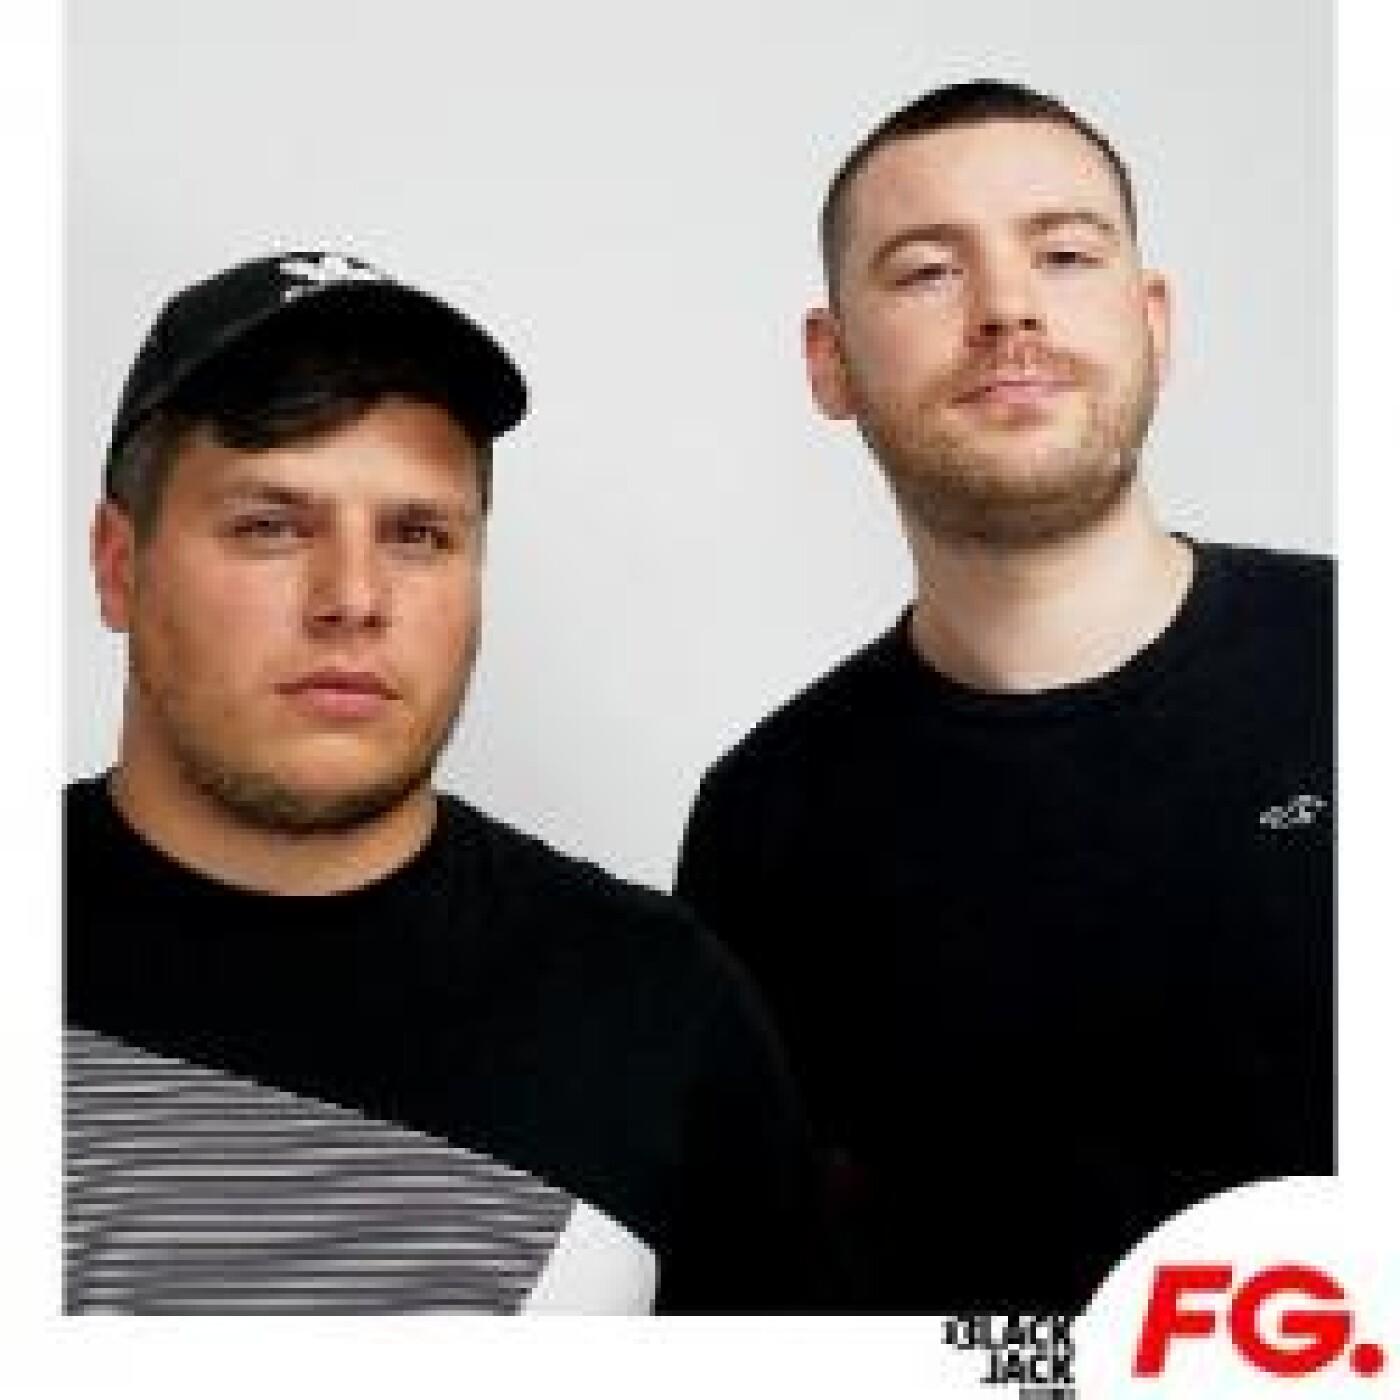 CLUB FG : MIDNIGHT CITY